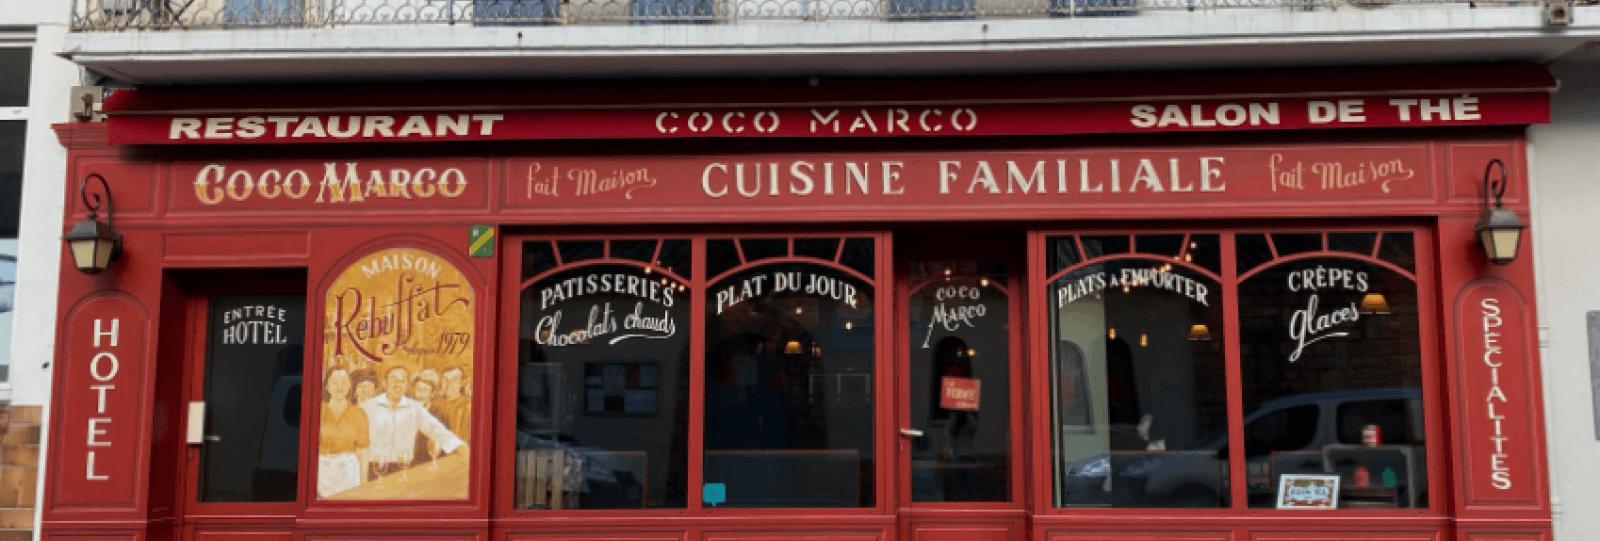 Restaurant Salon de thé Coco Marco